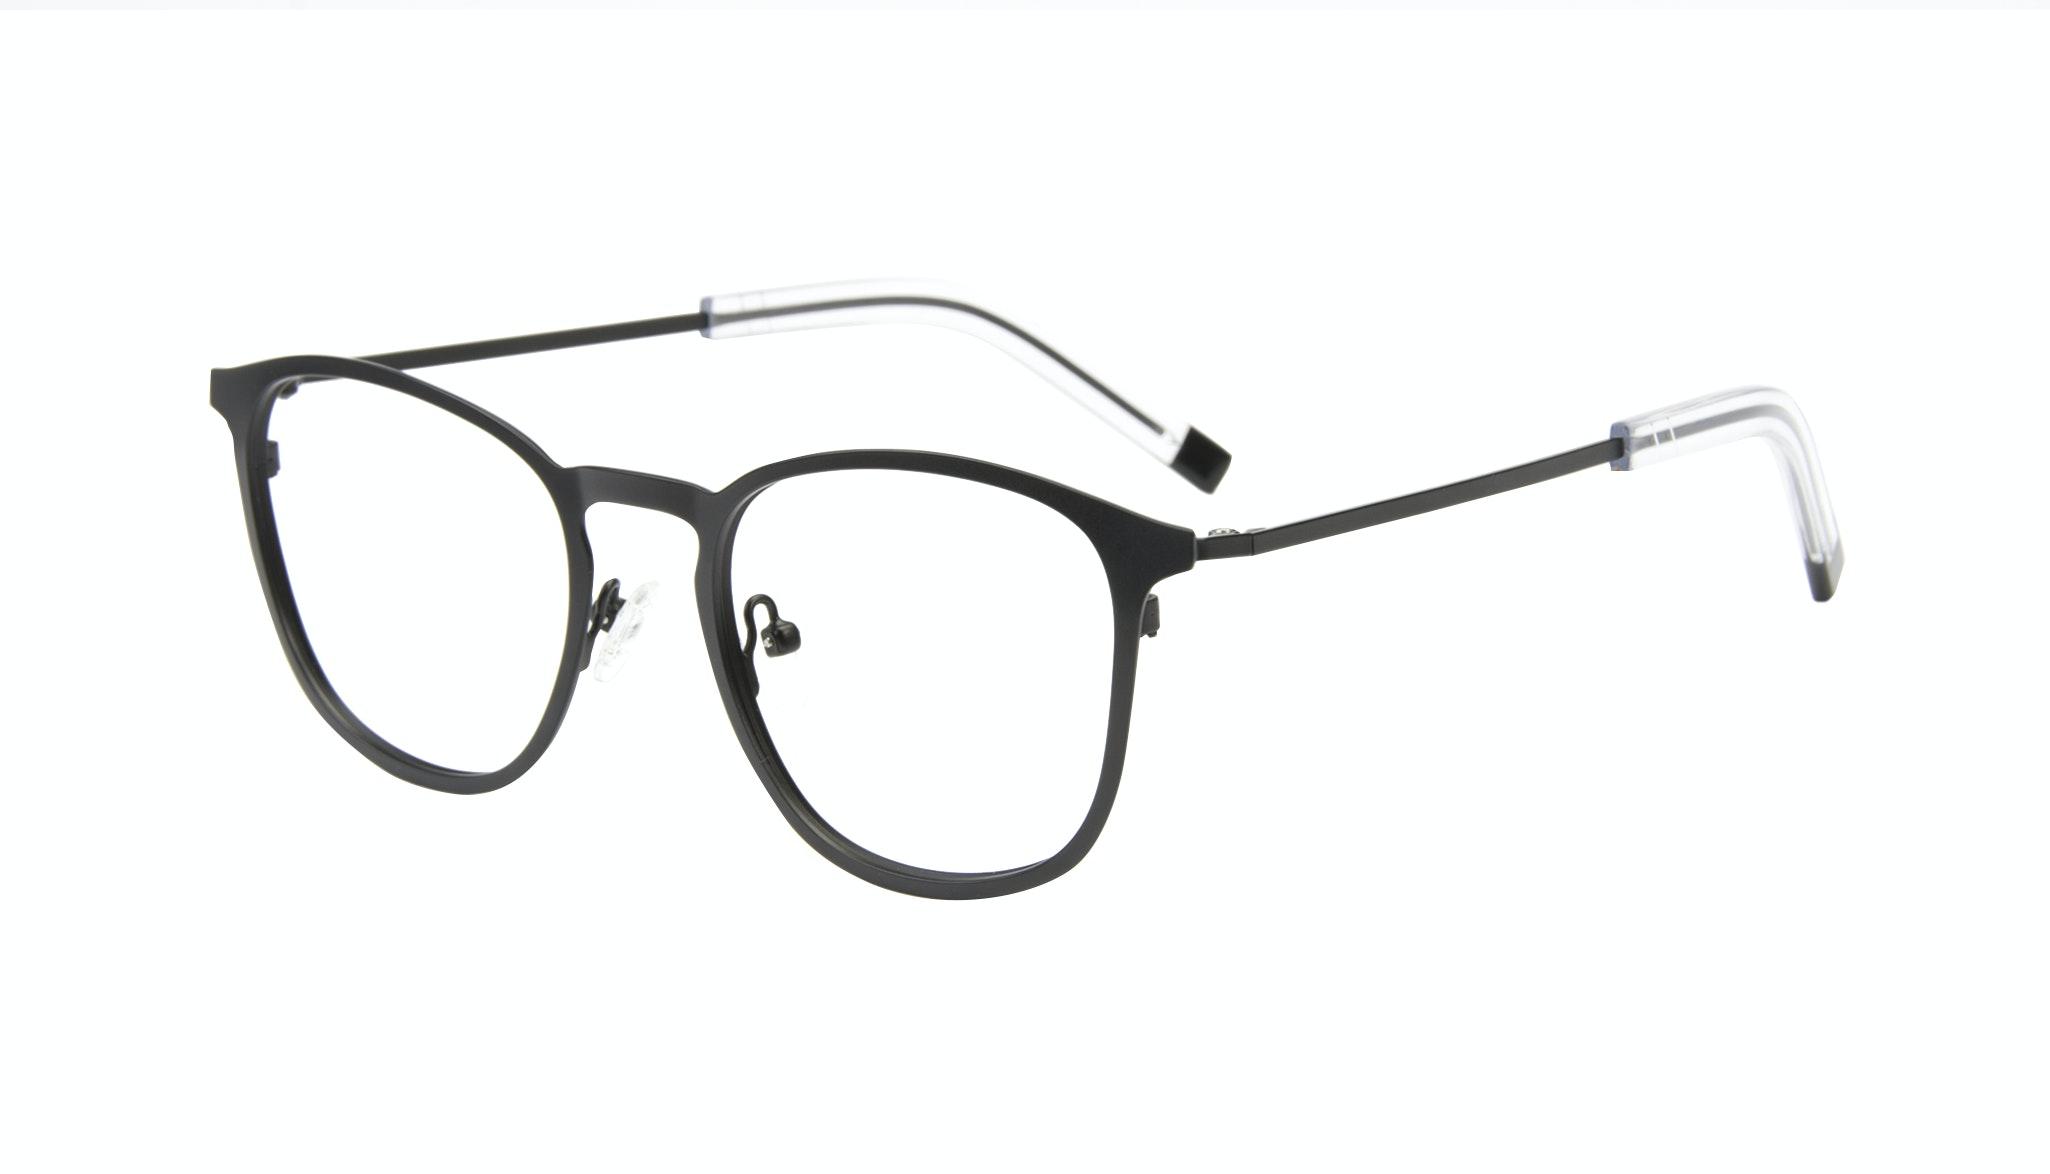 Affordable Fashion Glasses Rectangle Square Eyeglasses Men Core Matte Black Tilt